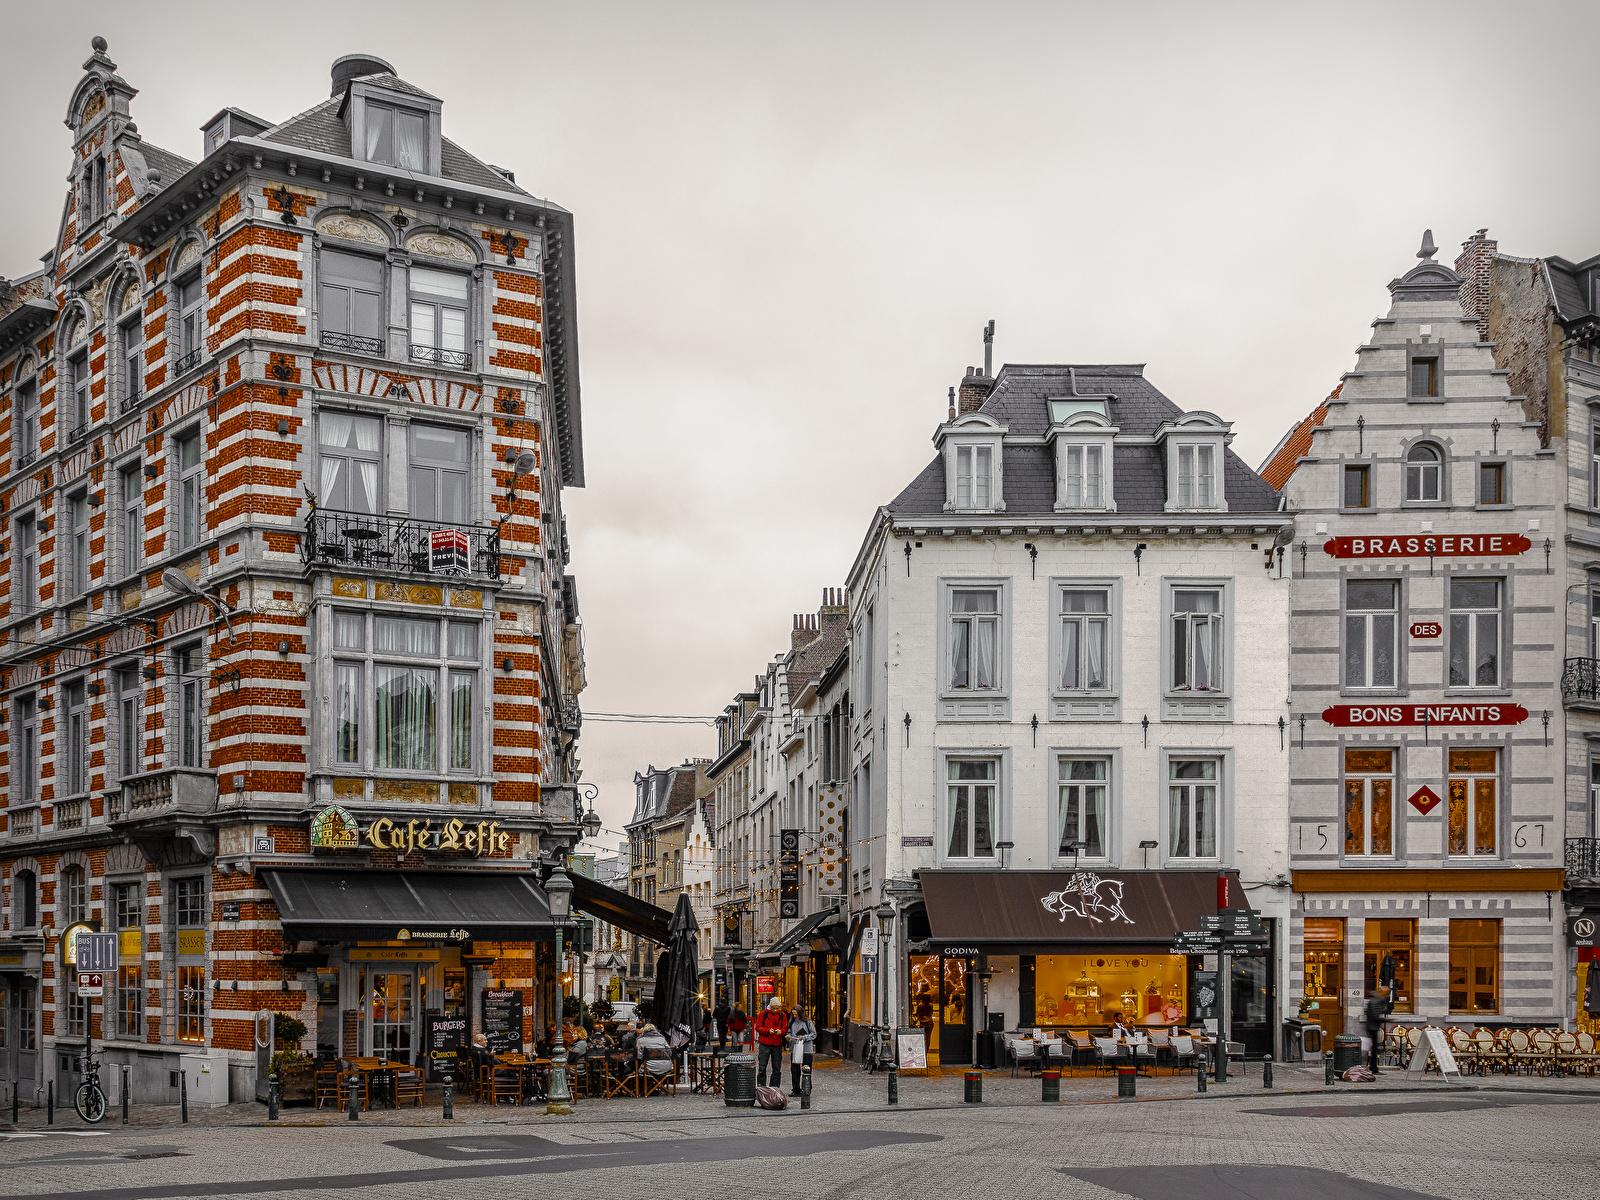 Обои Бельгия Brussels Кафе Улица Города Здания 1600x1200 улиц улице Дома город